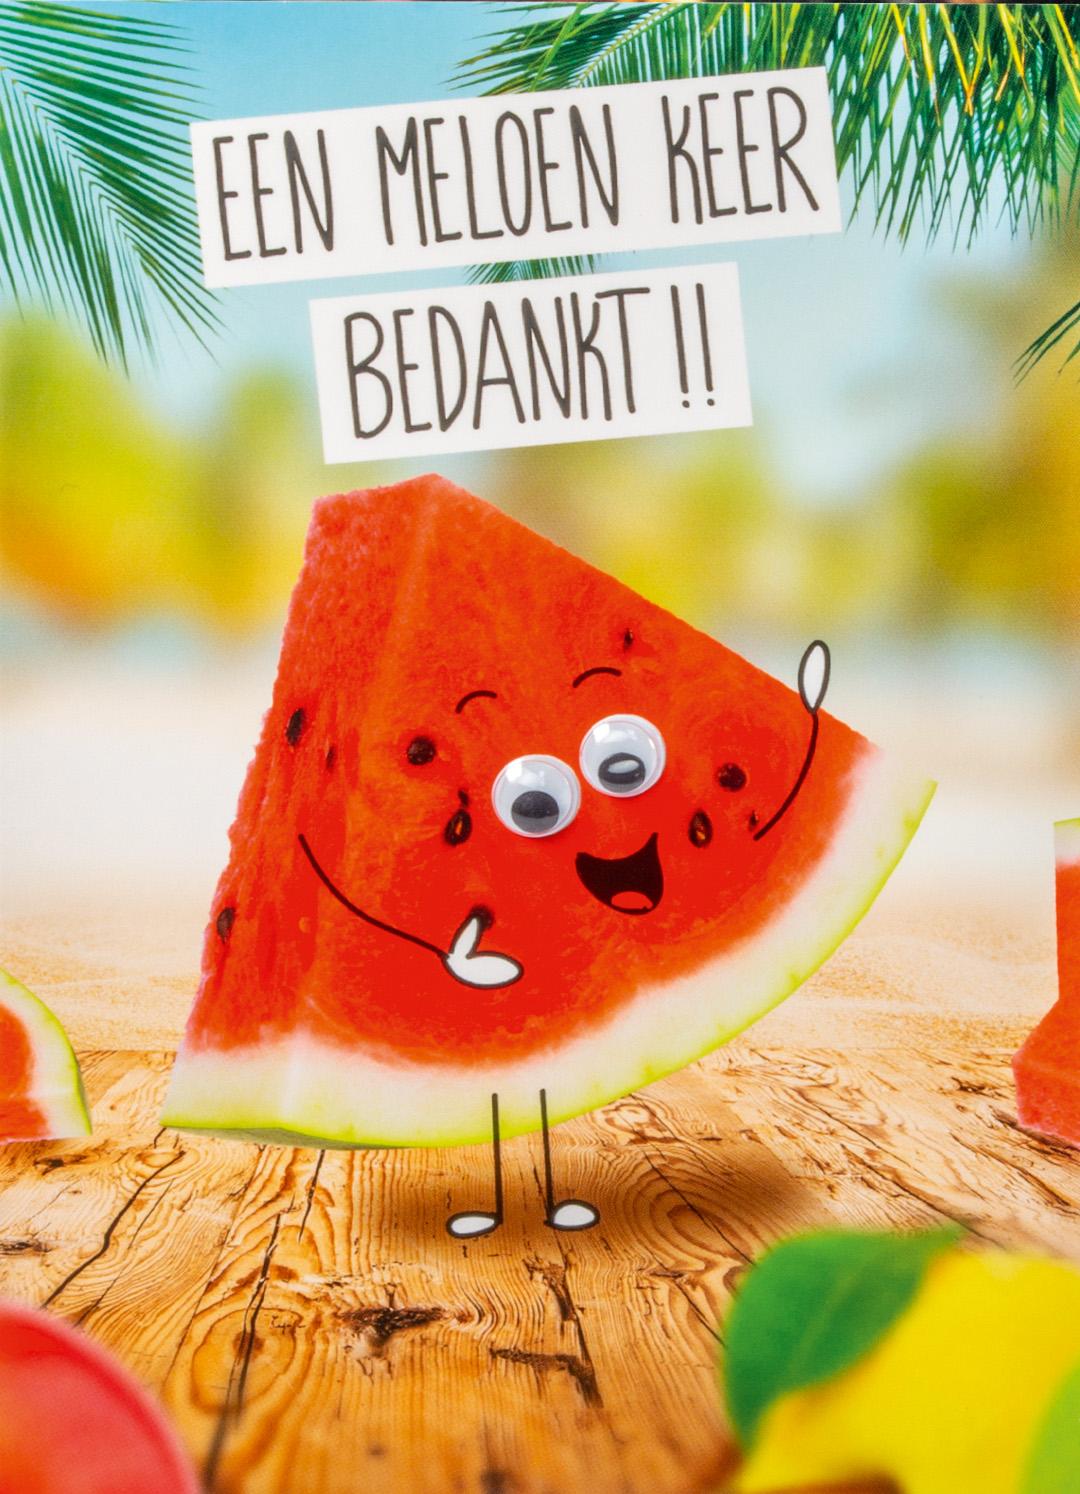 OMG Wenskaart Meloen